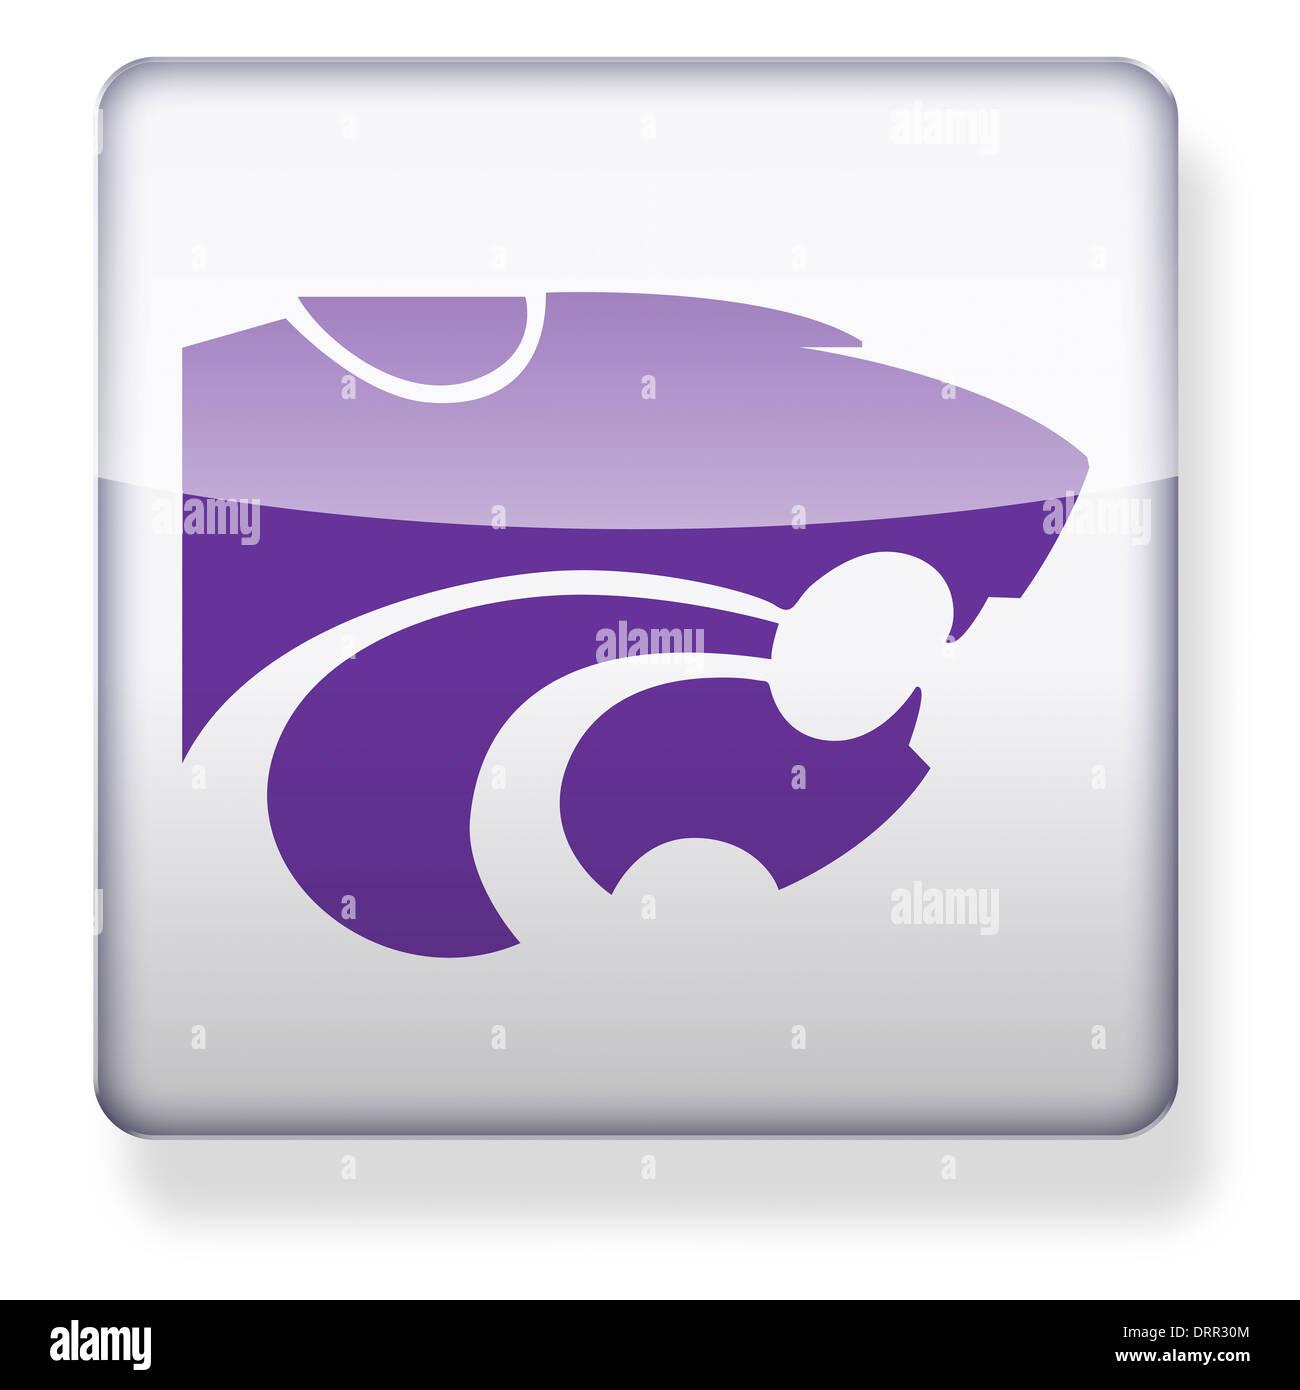 Kansas State Wildcats Us College Football Logo As An App Icon Stock